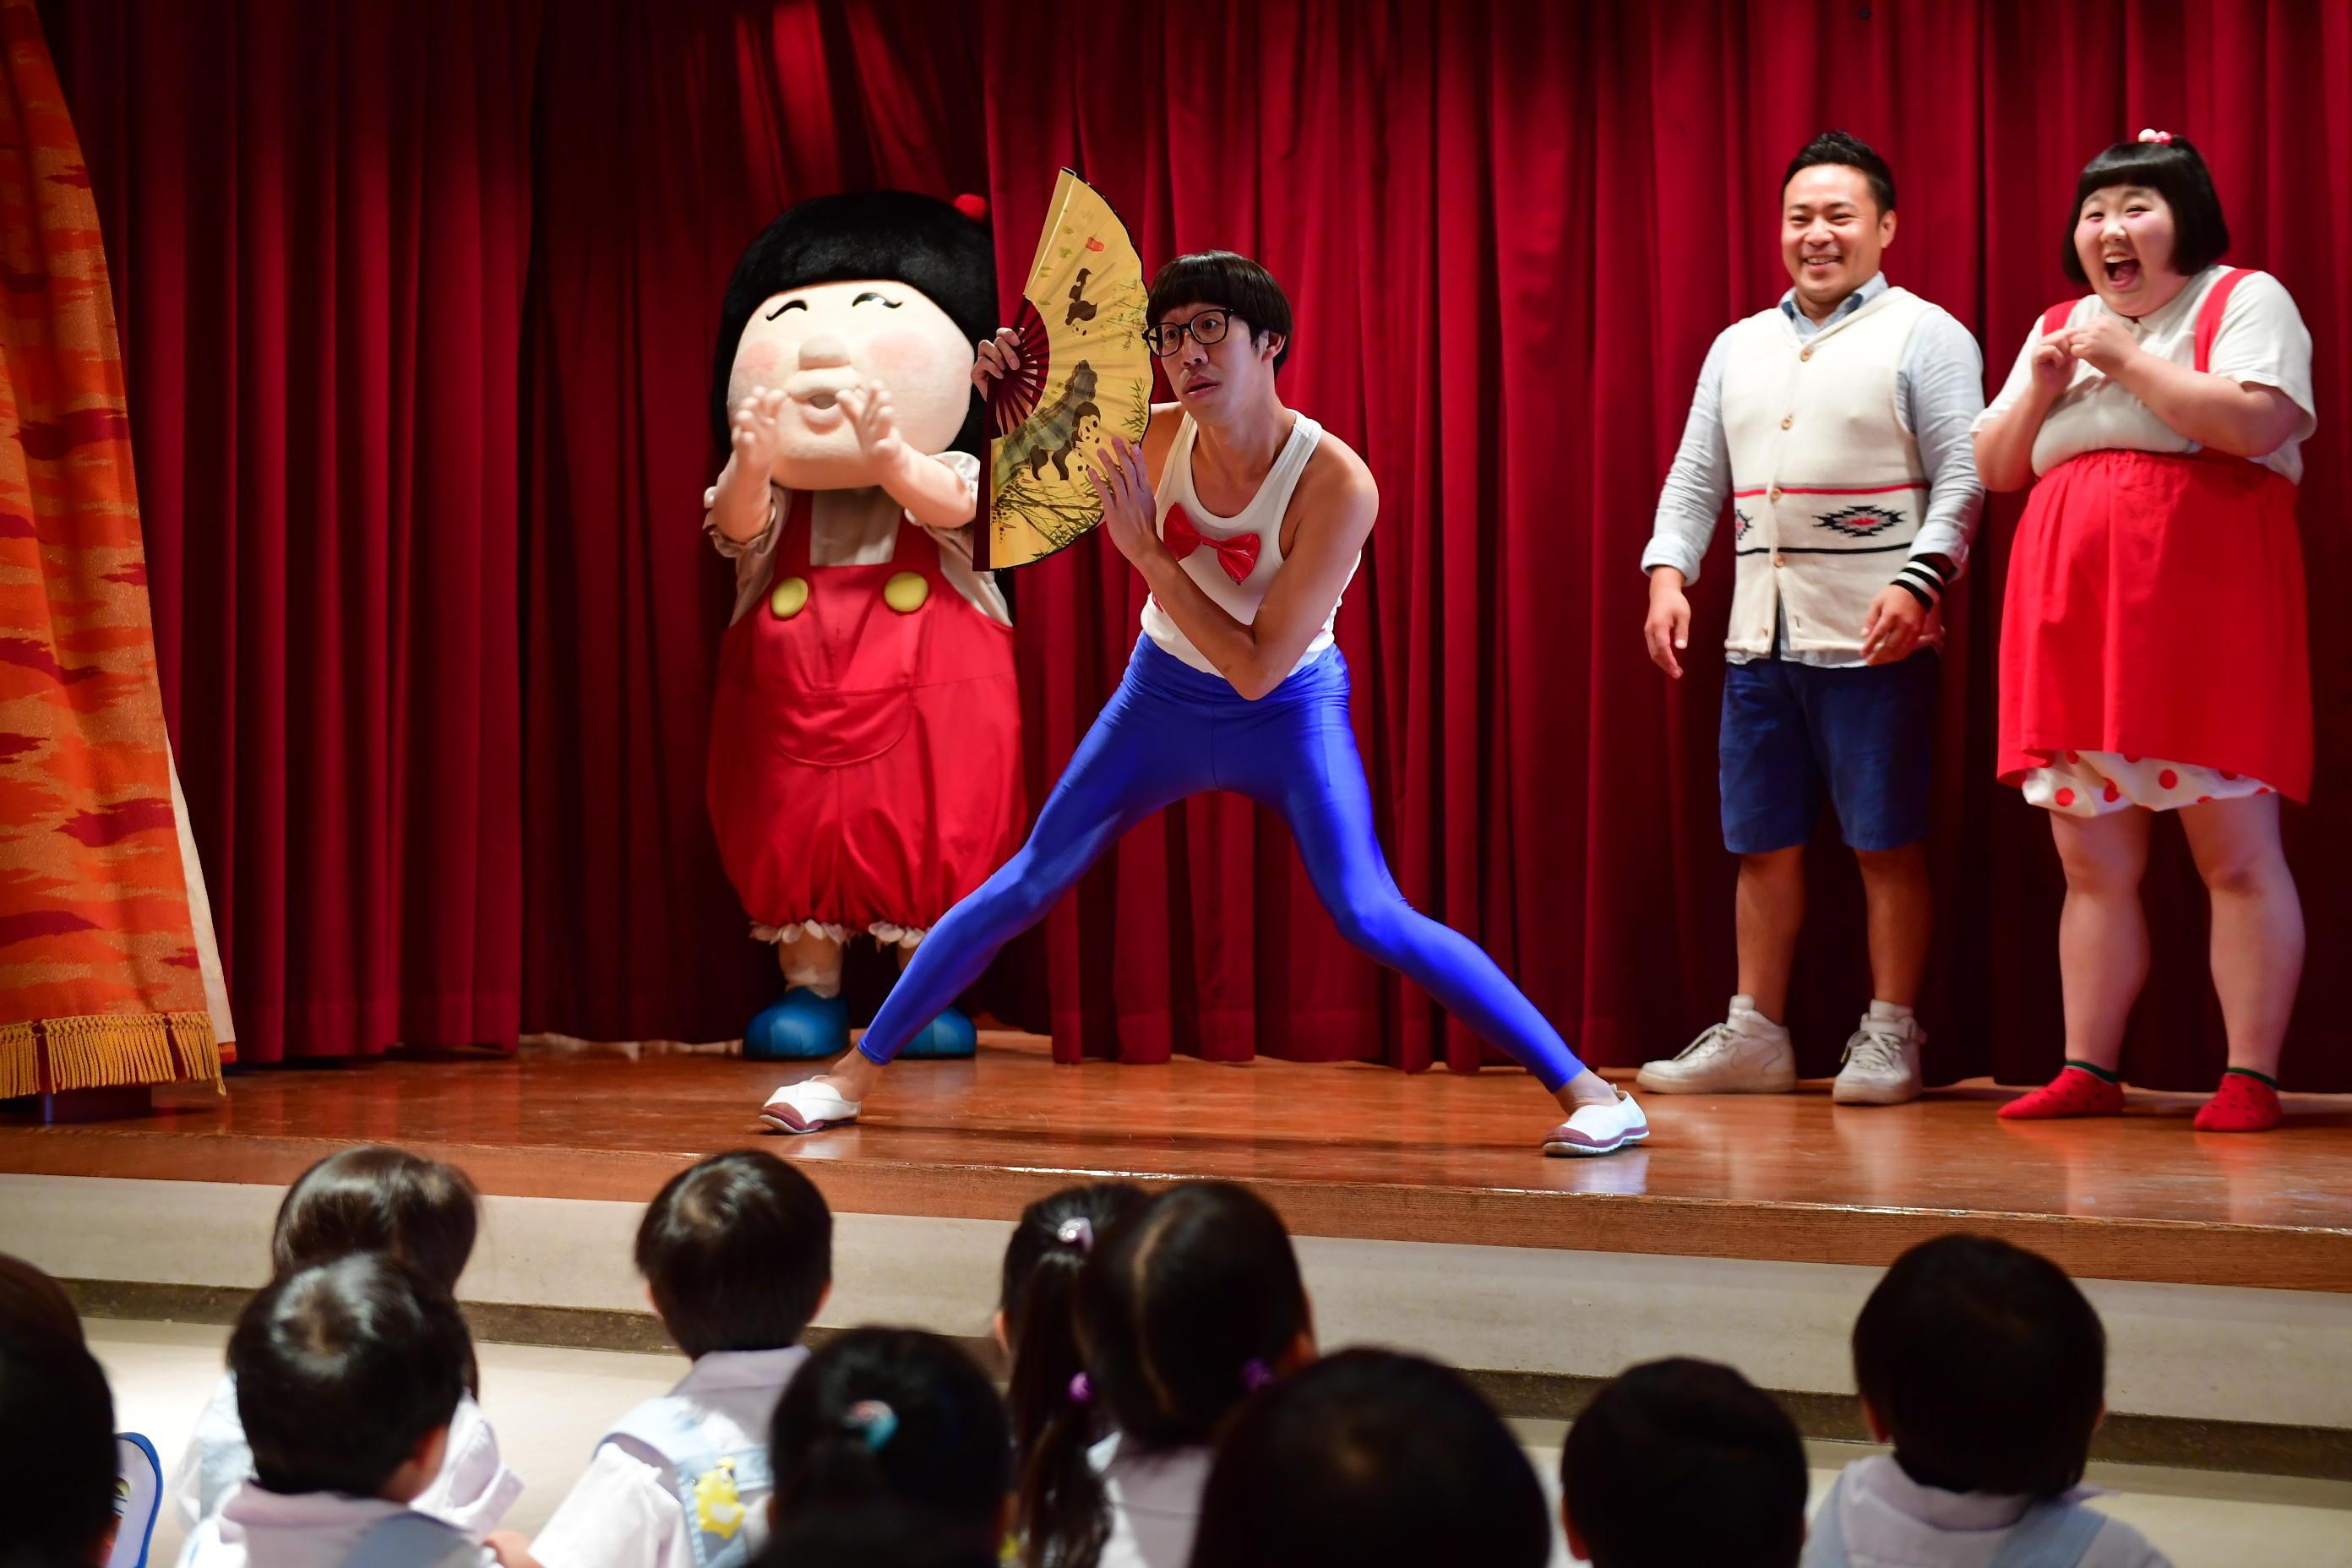 http://news.yoshimoto.co.jp/20180914155708-f0f29e67e5977226f0f8f686cb64693236aa8a3a.jpg